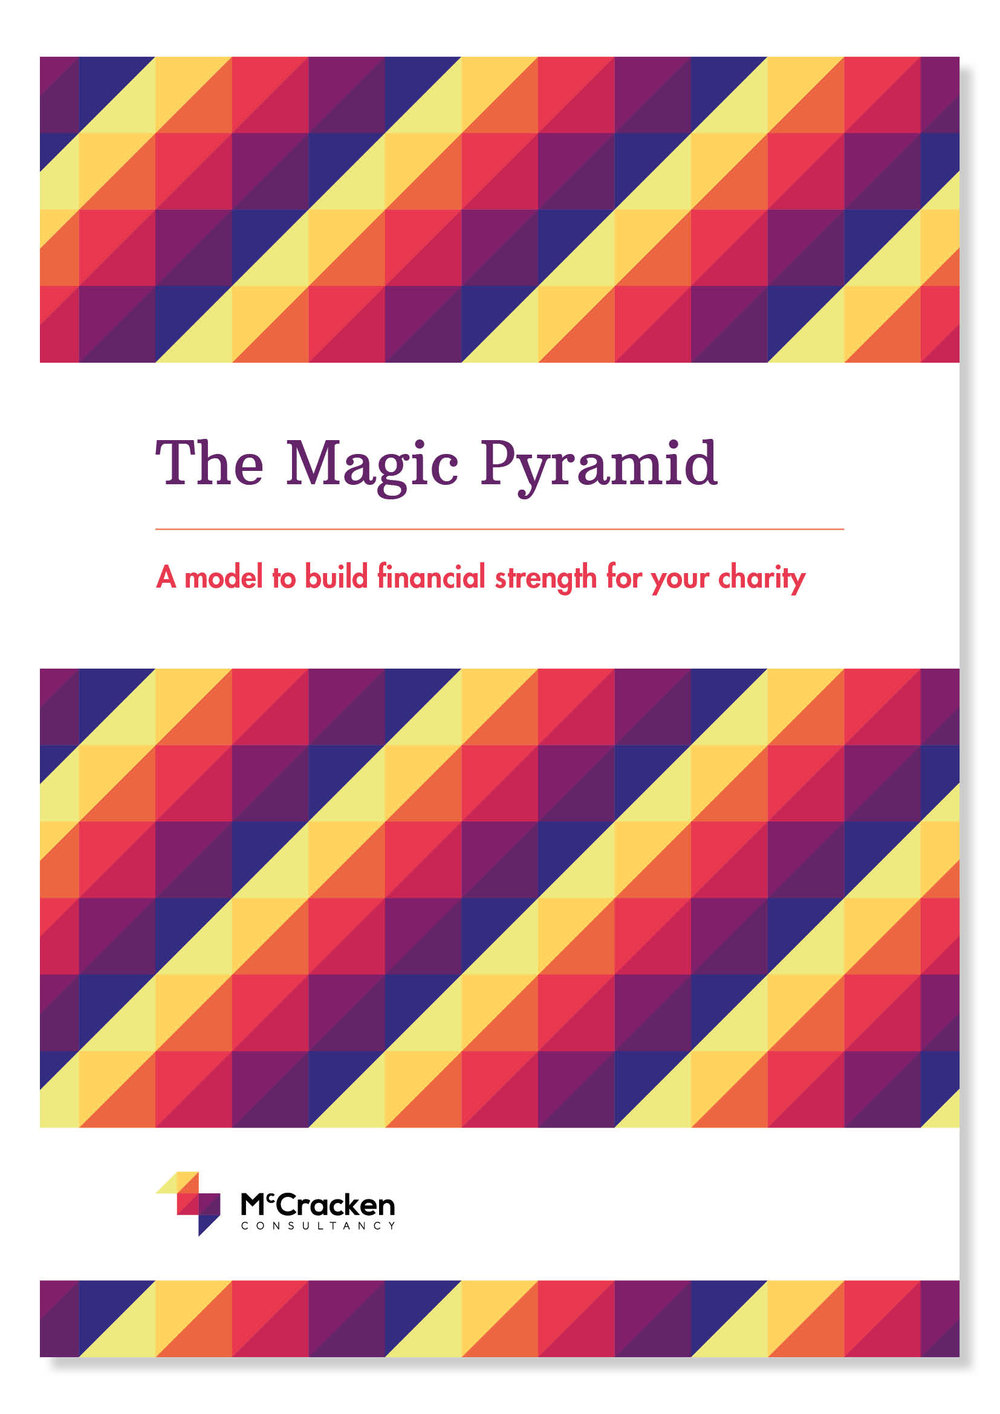 The Magic Pyramid